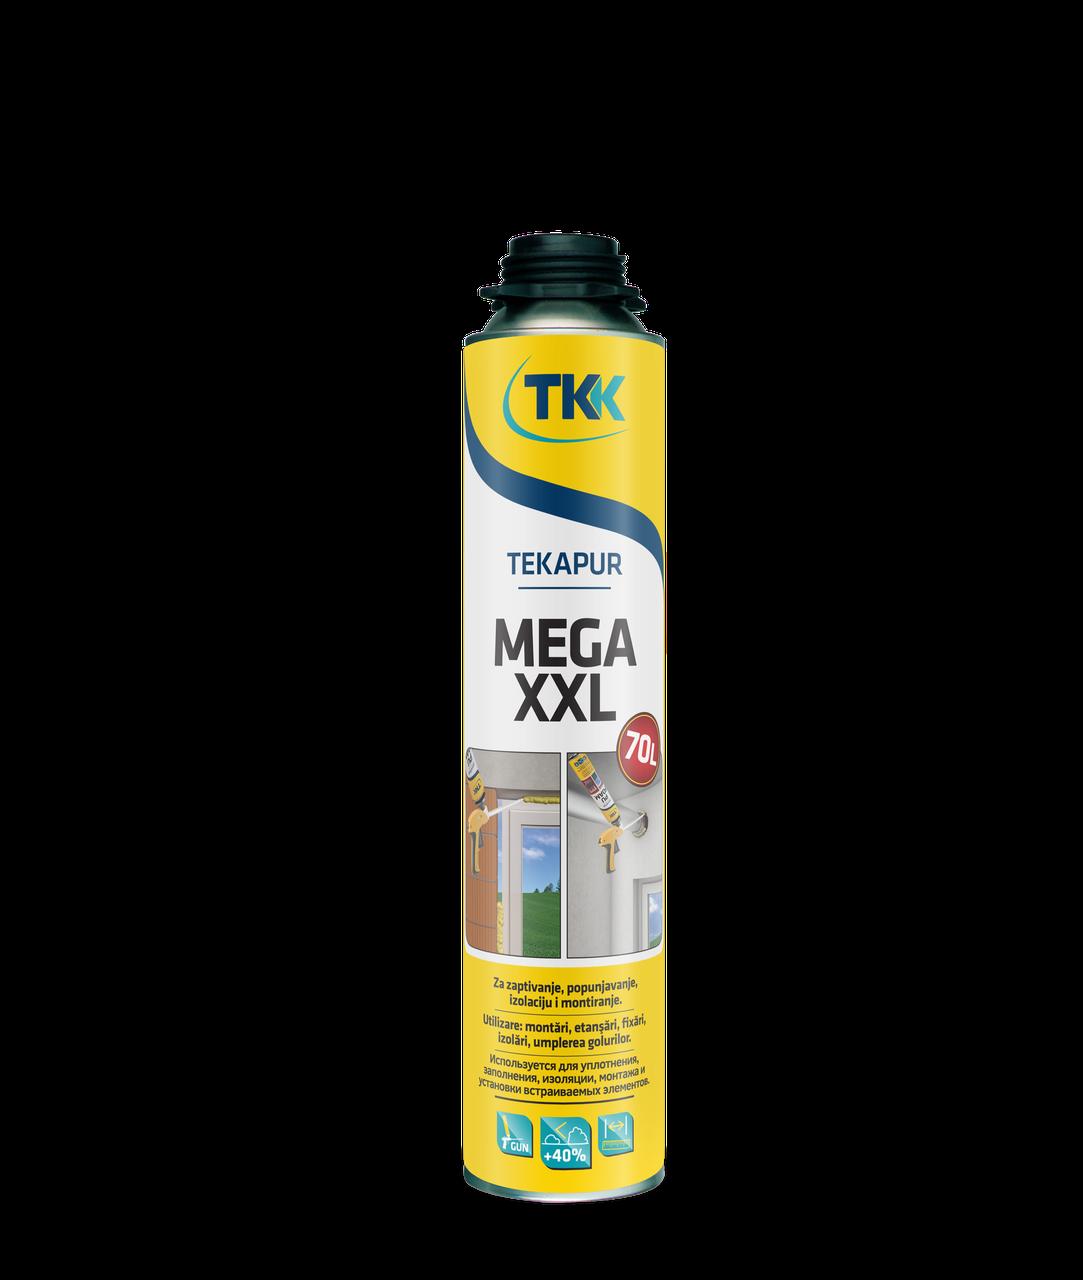 Пена монтажная под пистолет Tekapur MEGA XXL 65L 850 ml